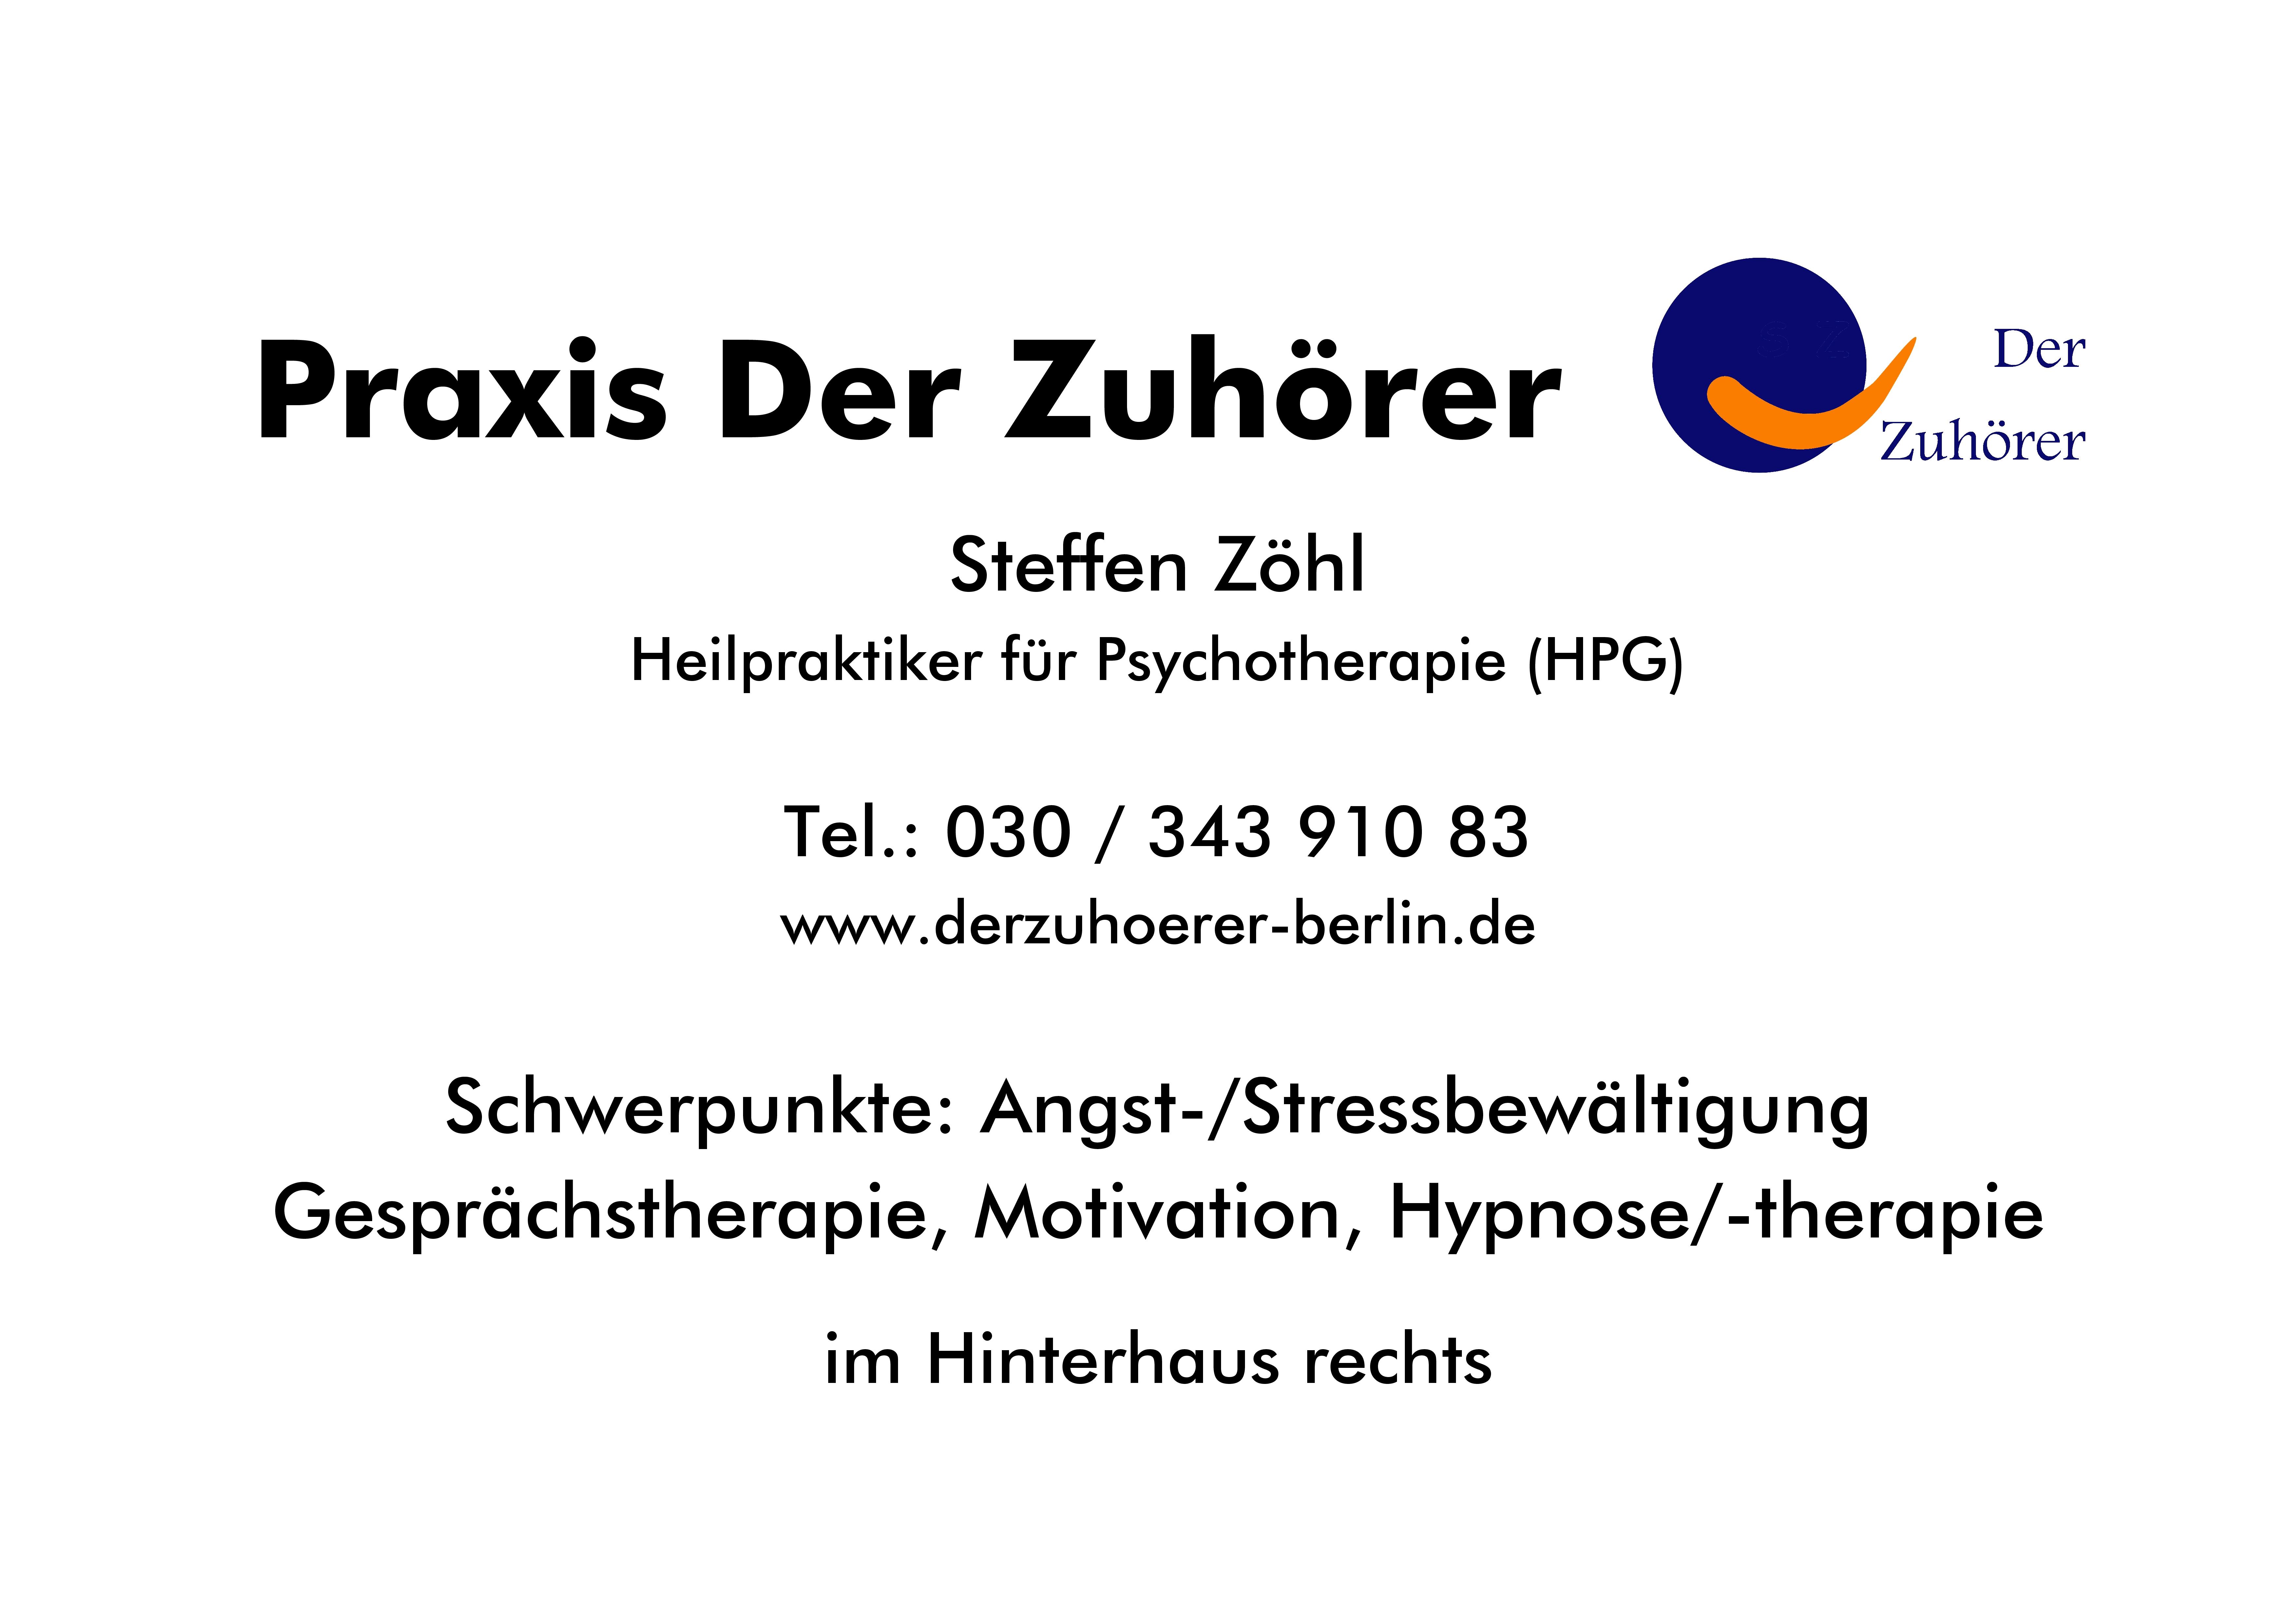 Hypnose Angst Phobie Stress Wundtstr. 5 14059 Berlin Charlottenburg